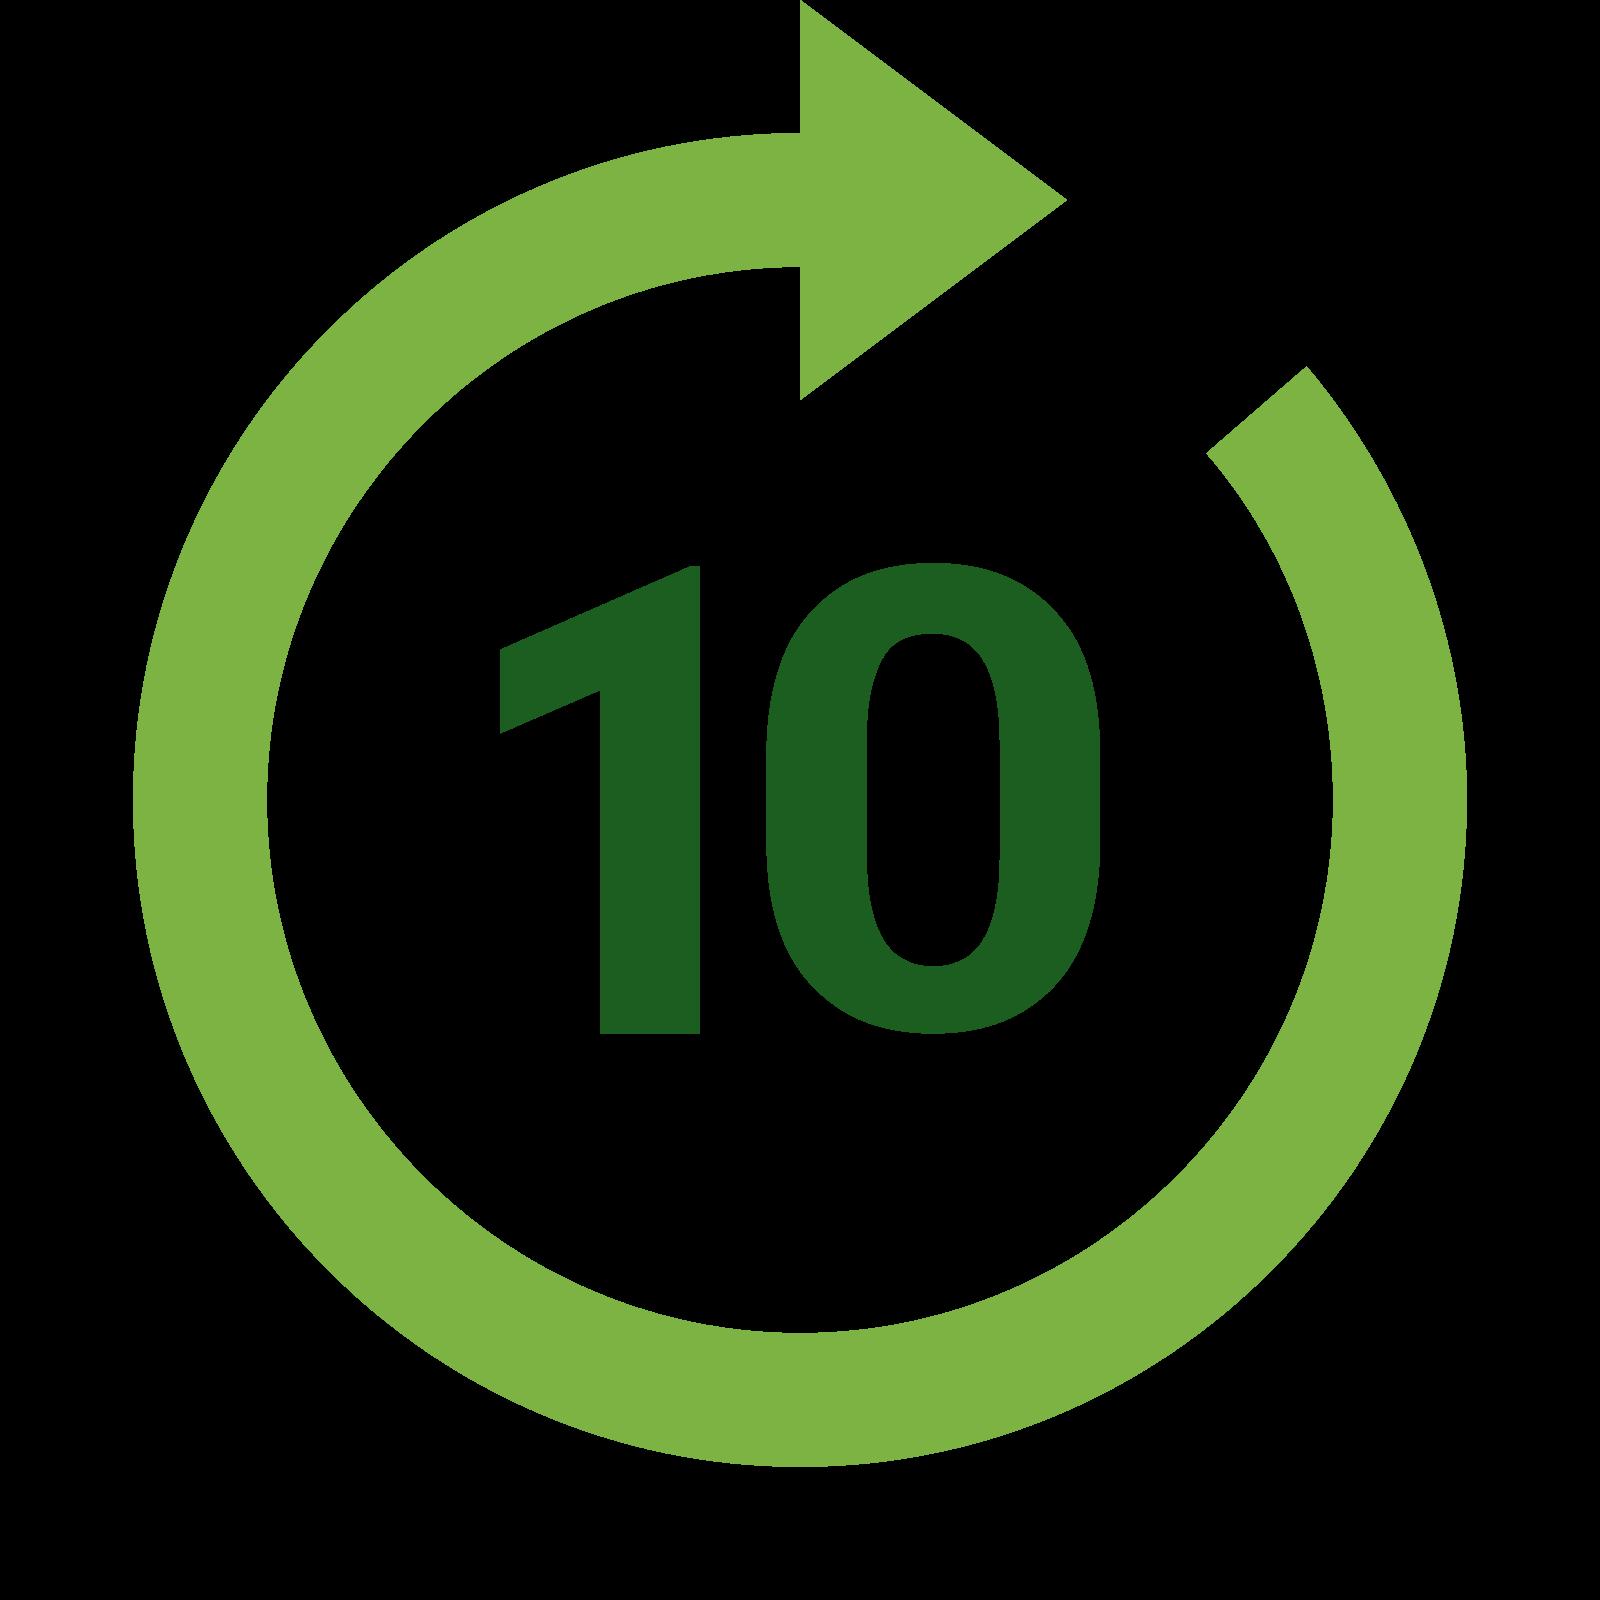 Forward 10 icon